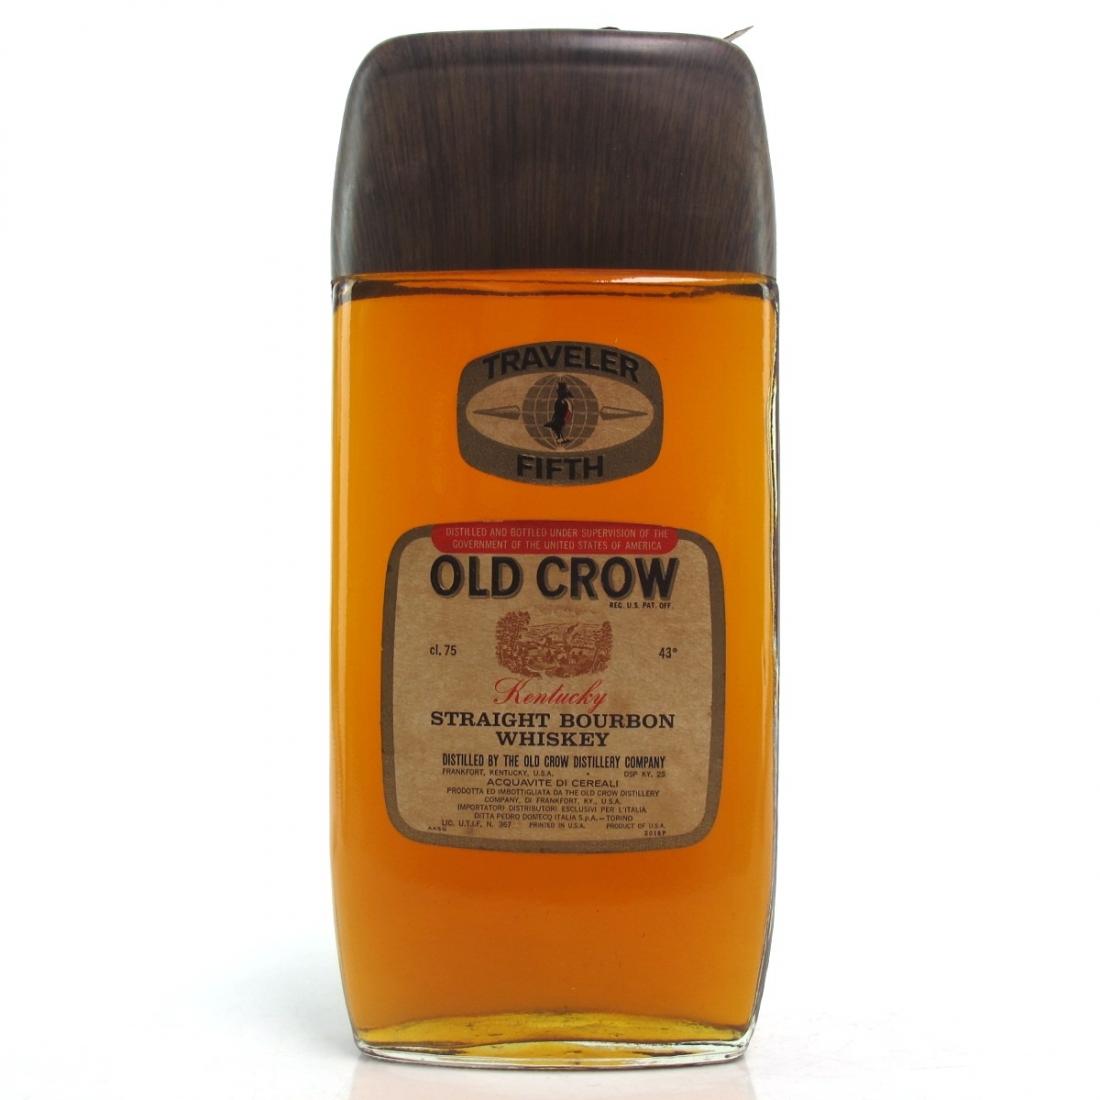 Old Crow Traveler Fifth Bourbon 1970s